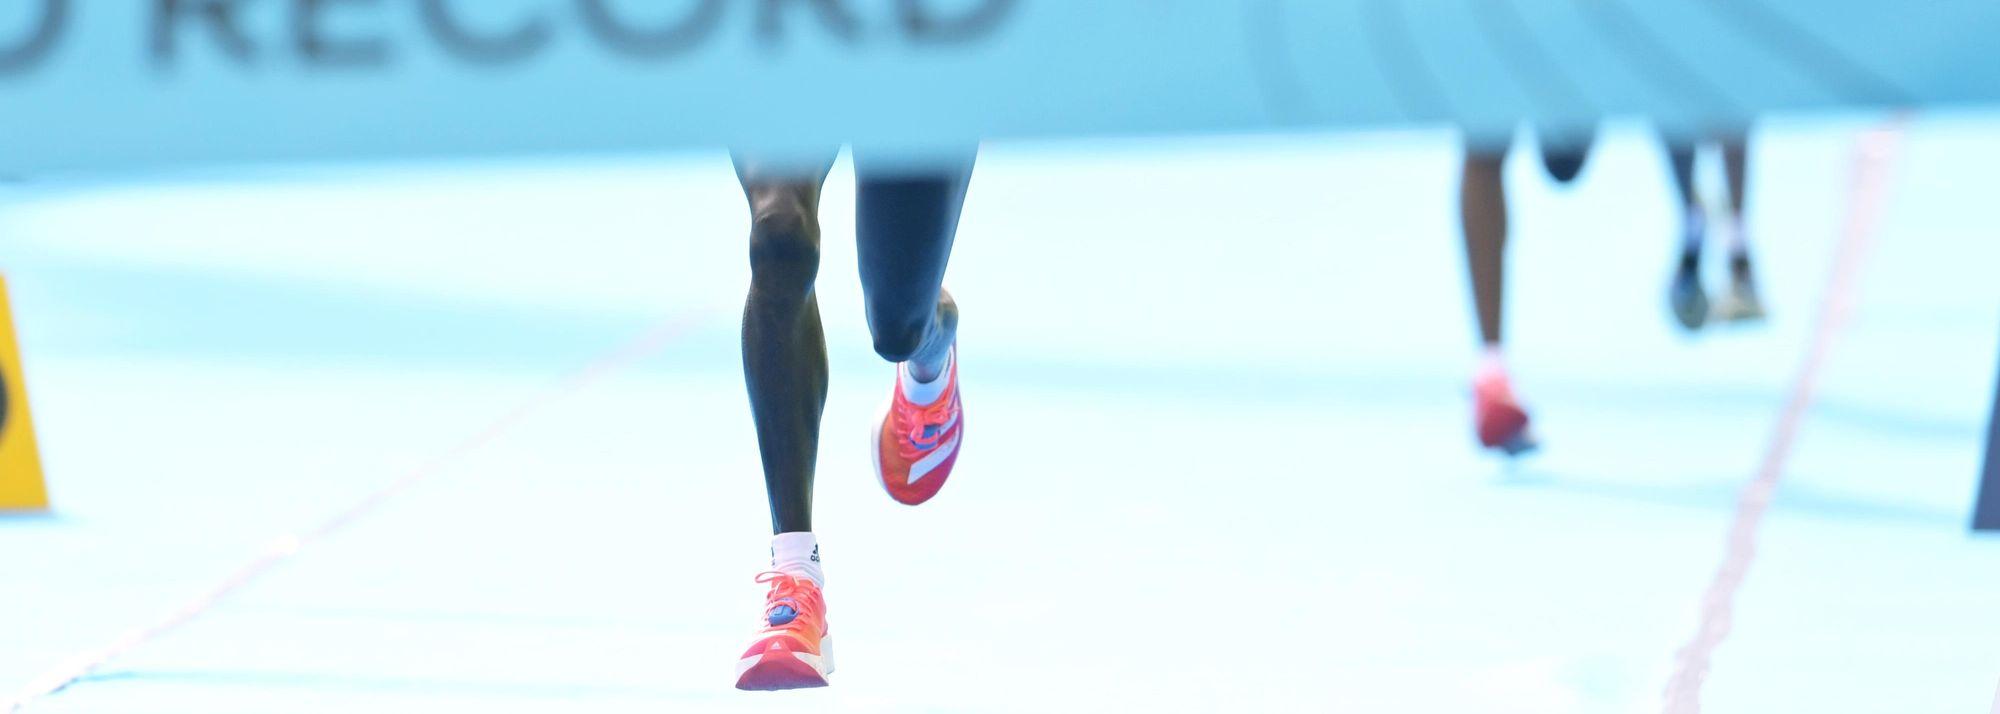 Jepchirchir breaks women-only world record at World Athletics Half Marathon Championships Gdynia 2020